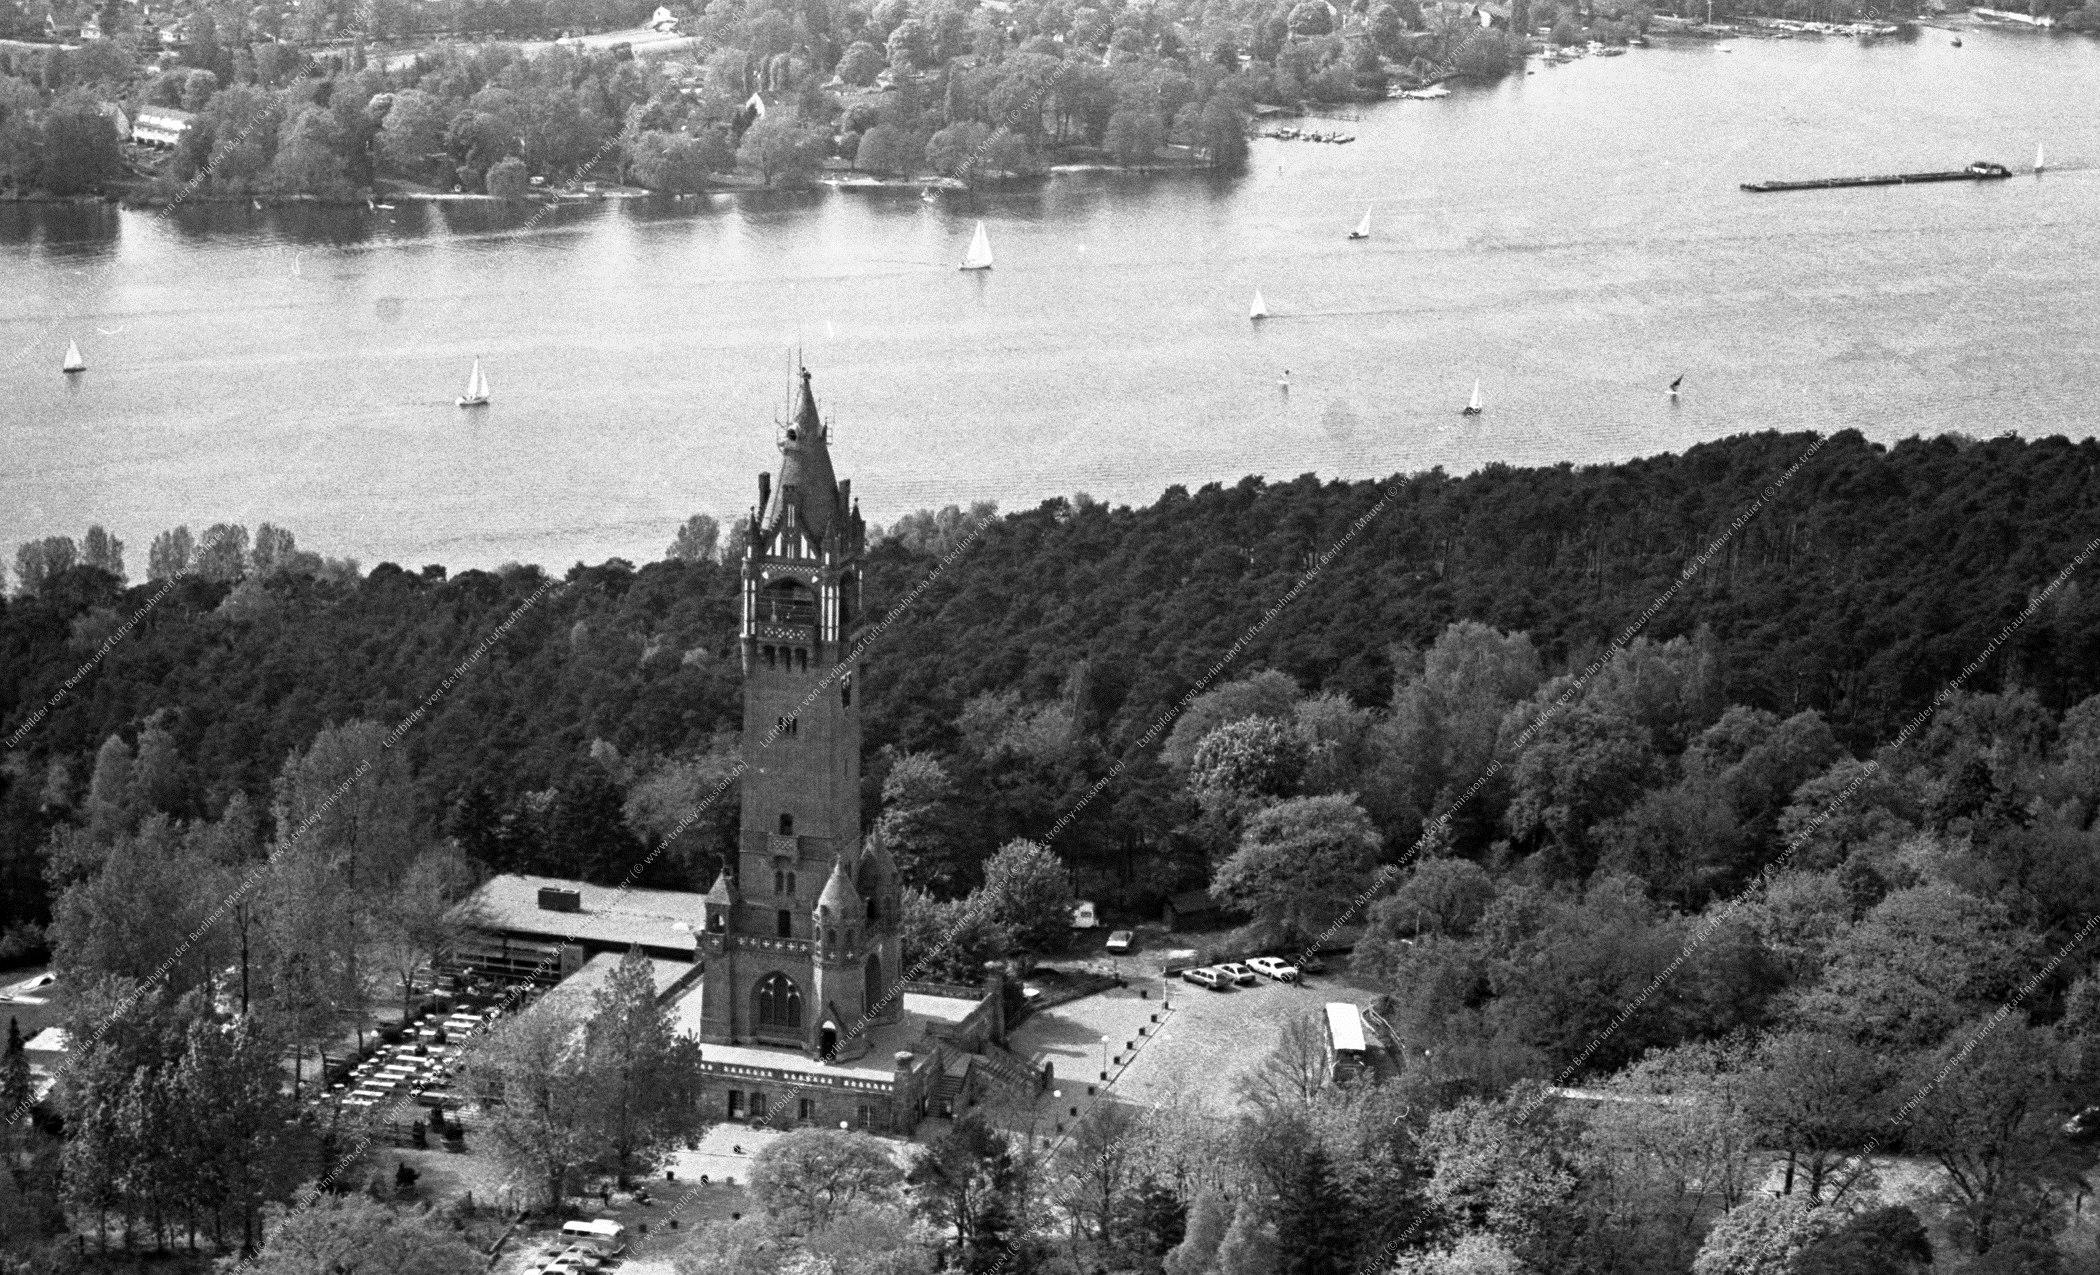 Berlin Luftaufnahme Grunewaldturm vom 12. Mai 1982 (Bild 093)